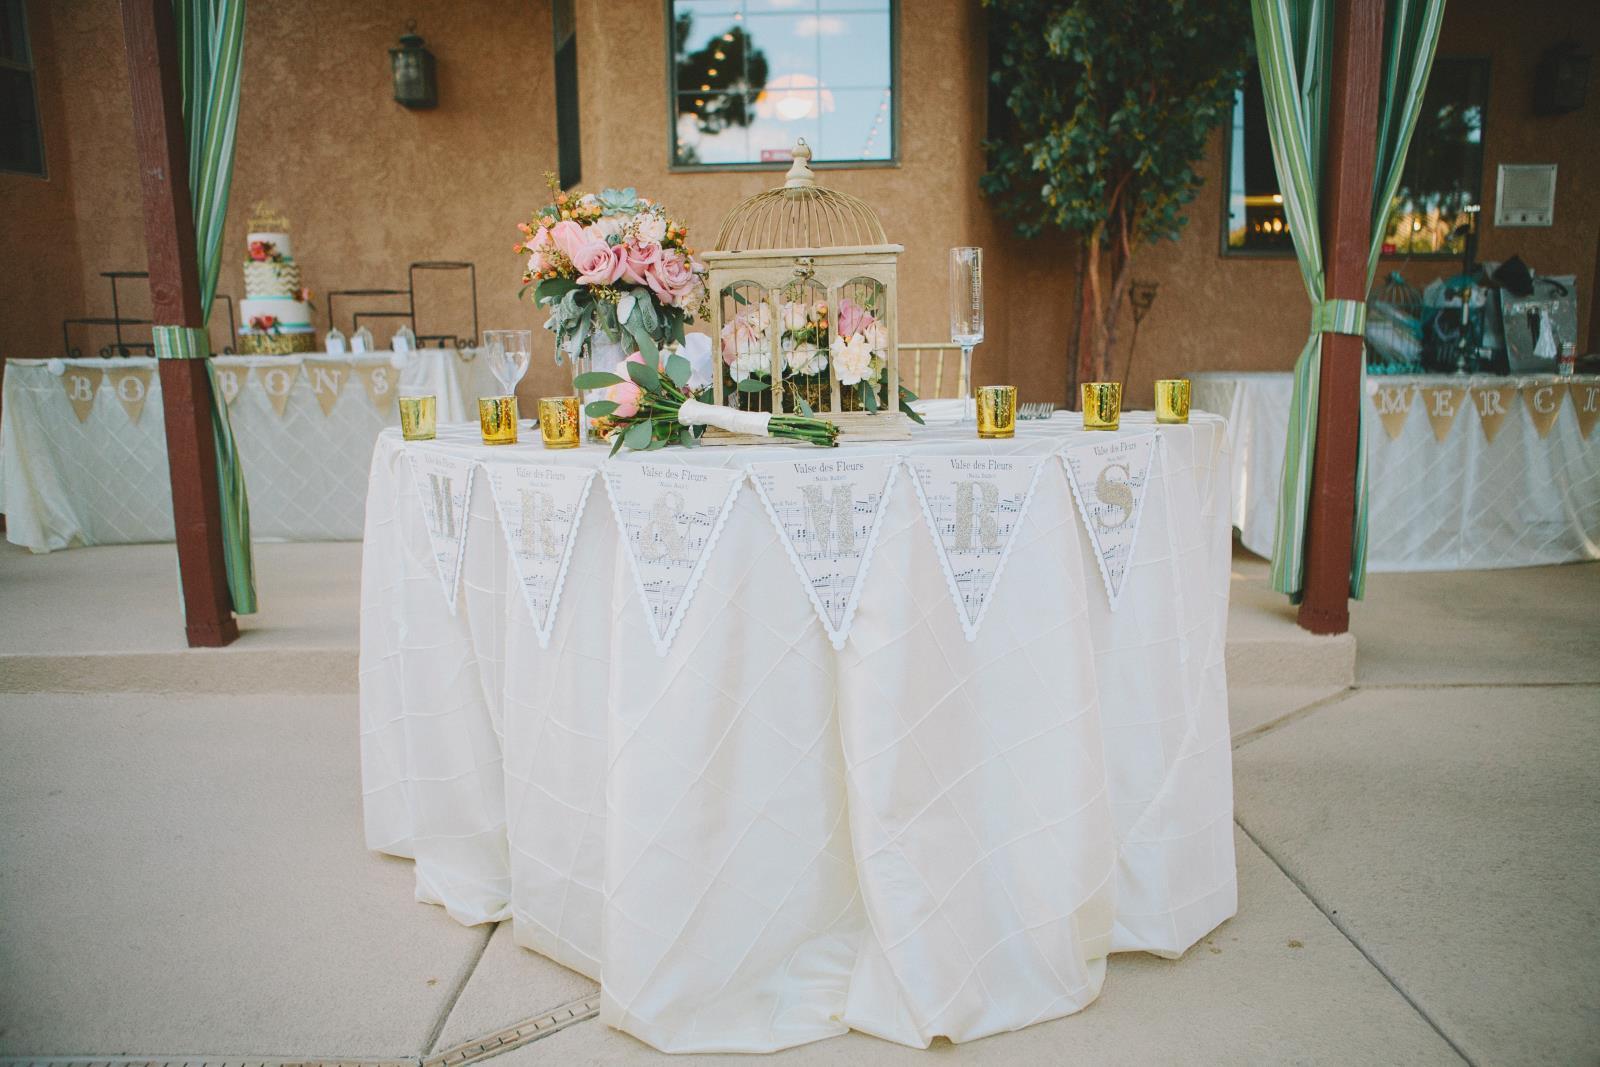 Wedding planning planners in las vegas amanda ianbrj j photography junglespirit Image collections